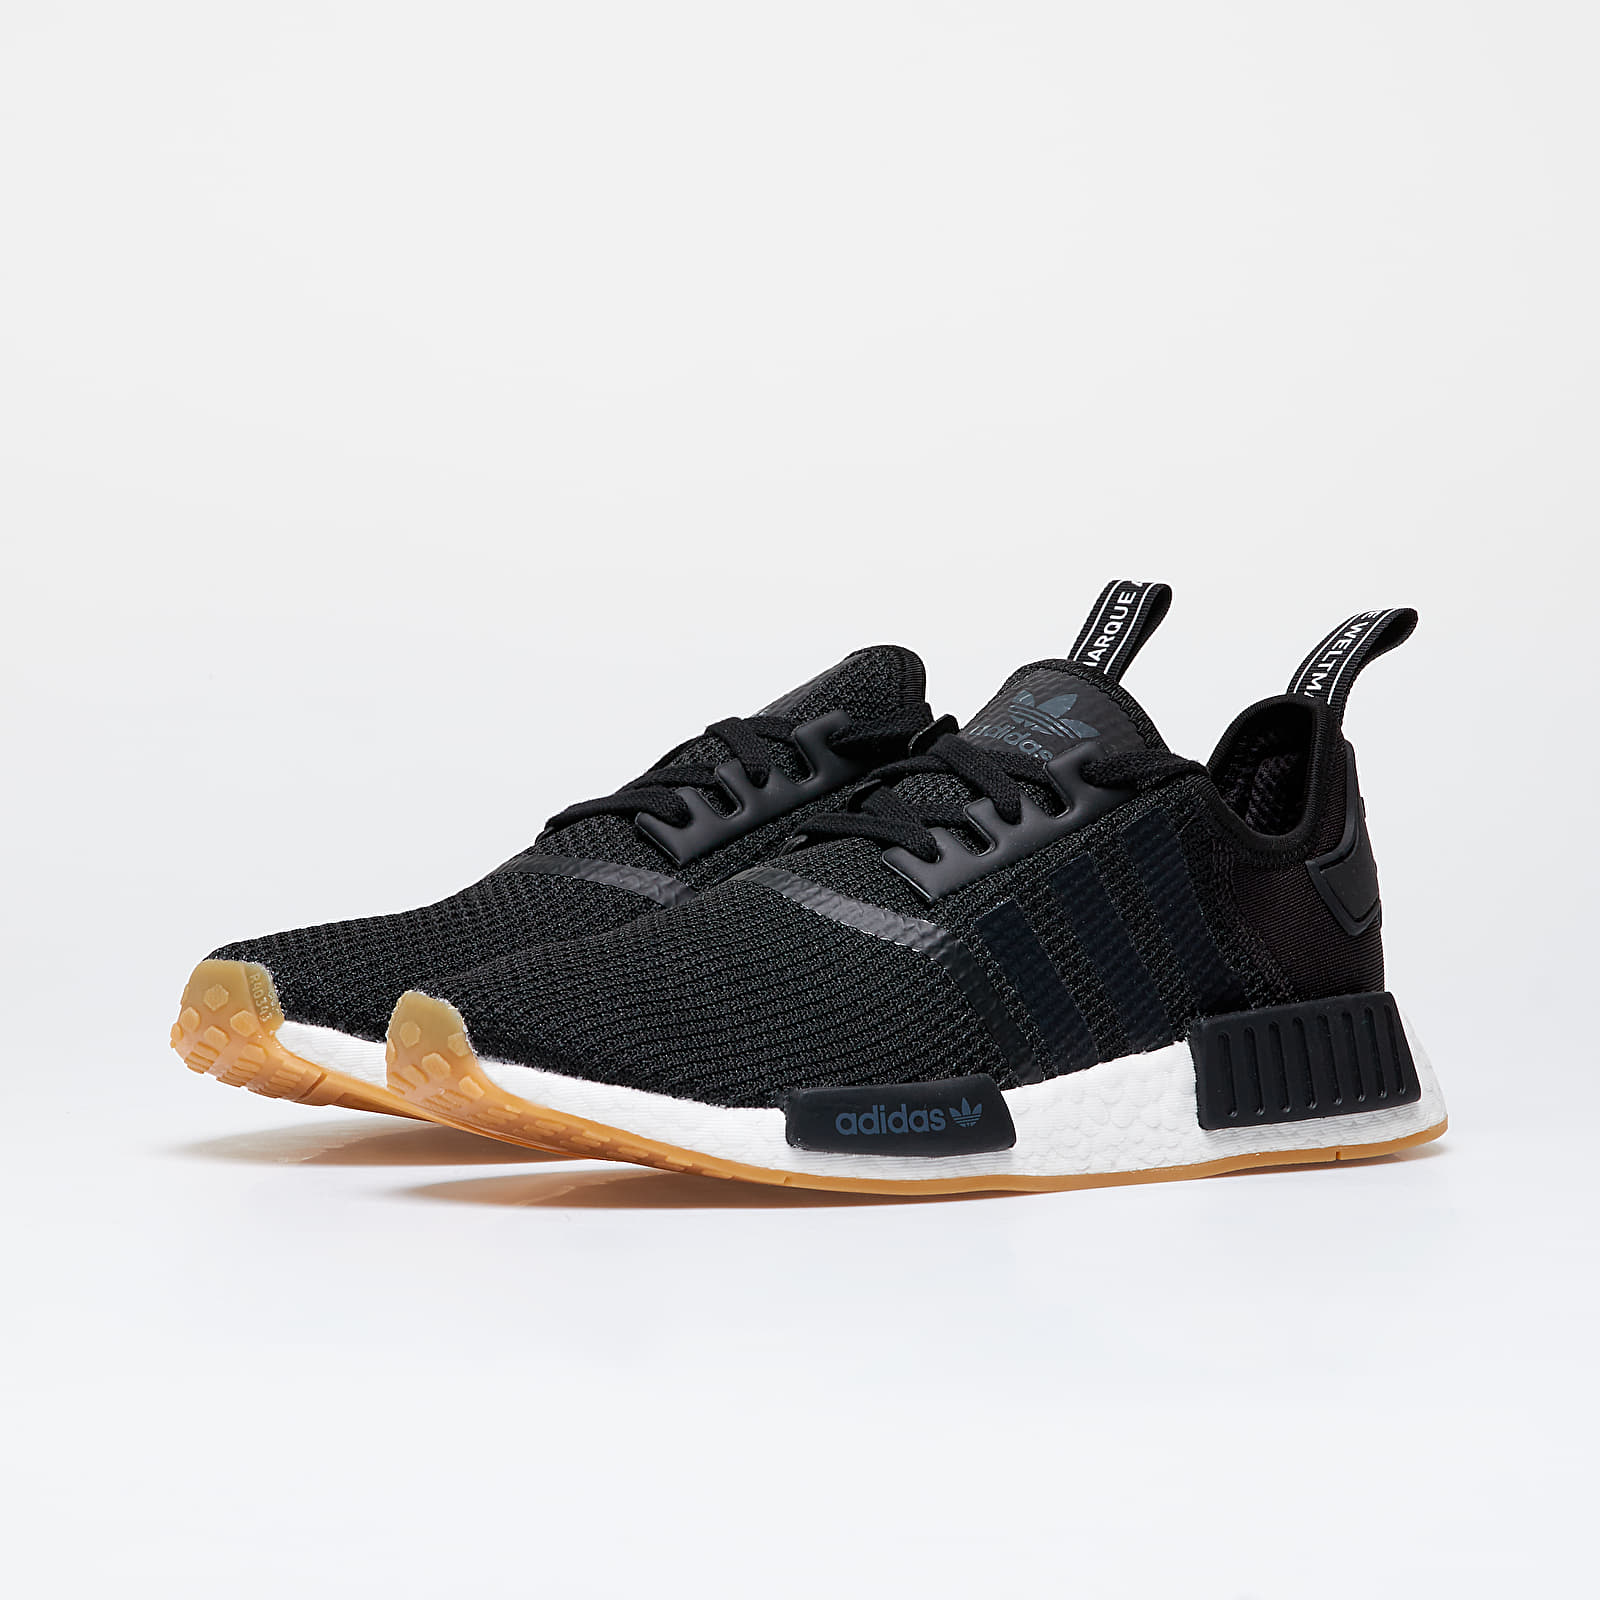 adidas nmd r1 black core